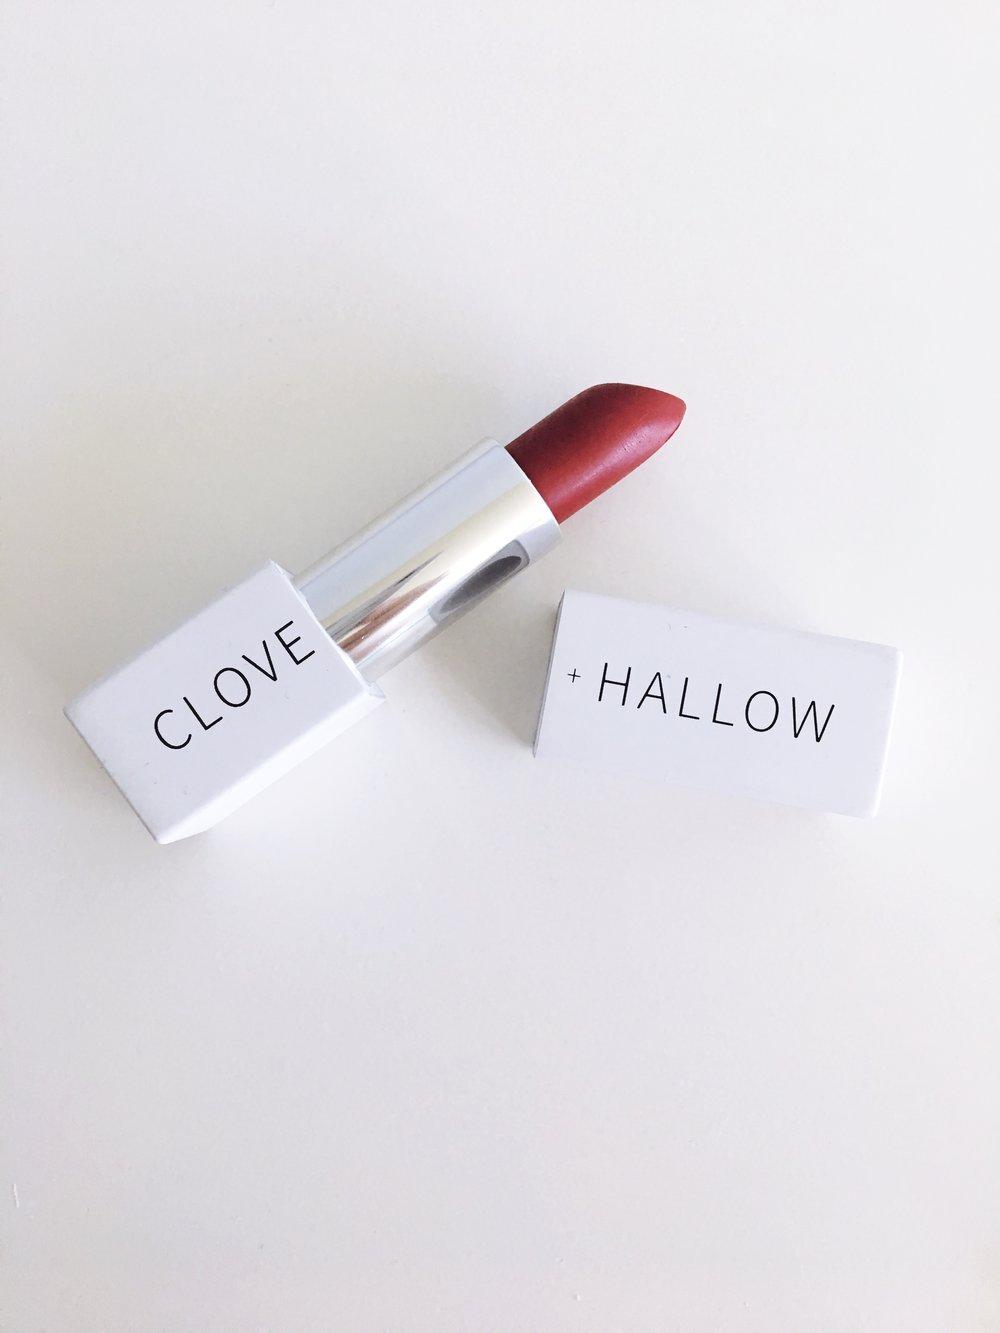 Clove and Hallow